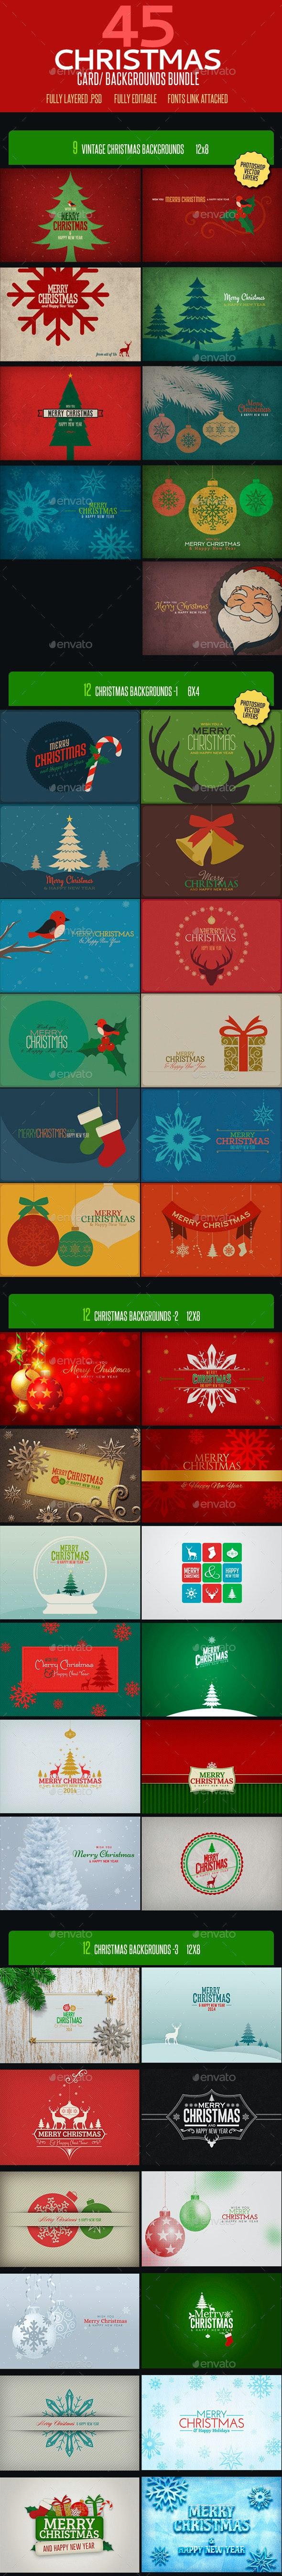 Christmas Card Backgrounds Bundle - Backgrounds Graphics